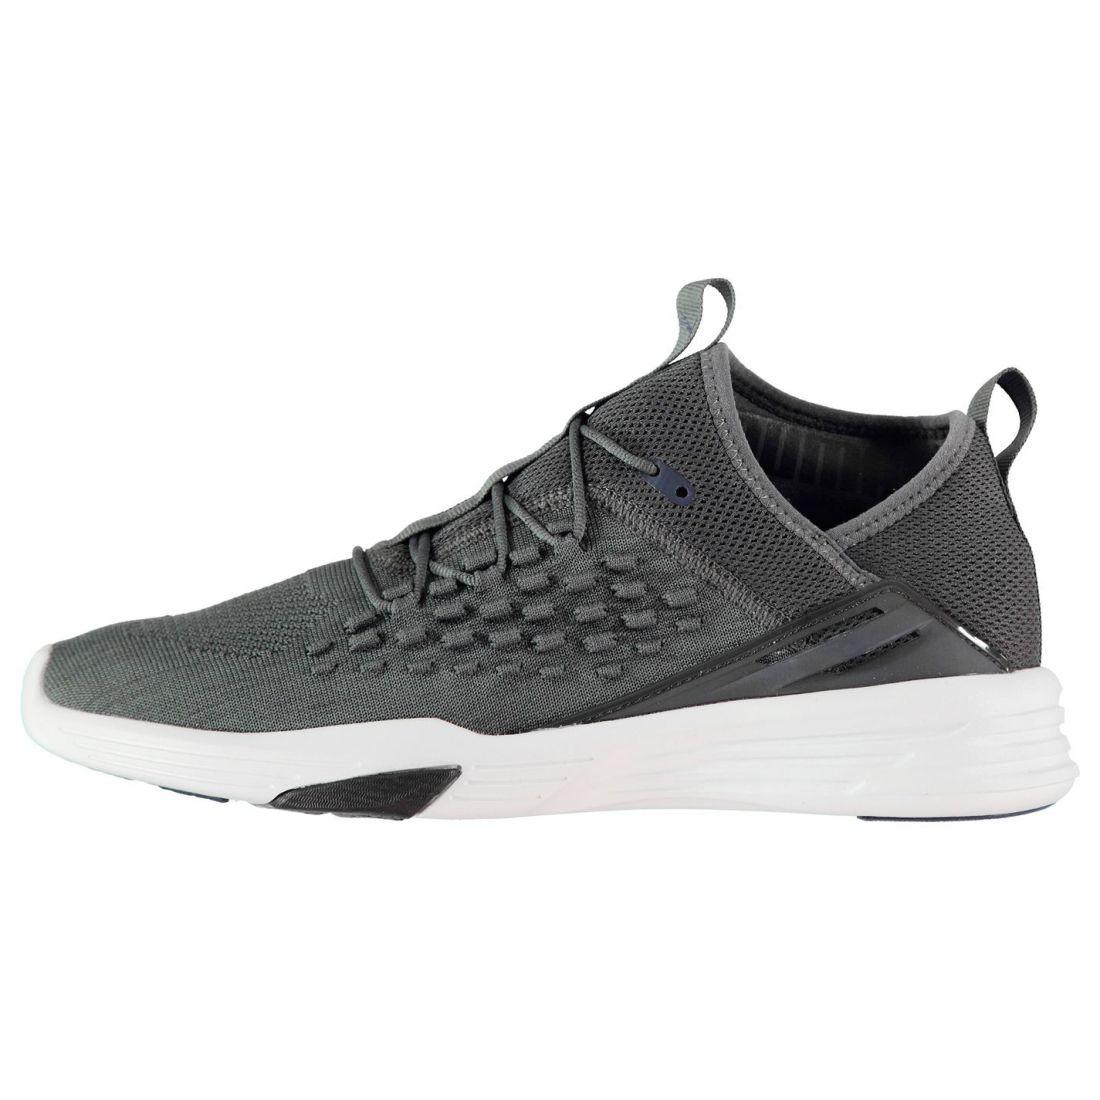 119603dd496 Puma Mantra Fusefit Sneakers Mens Gents Sport Activity Shoes Laces ...